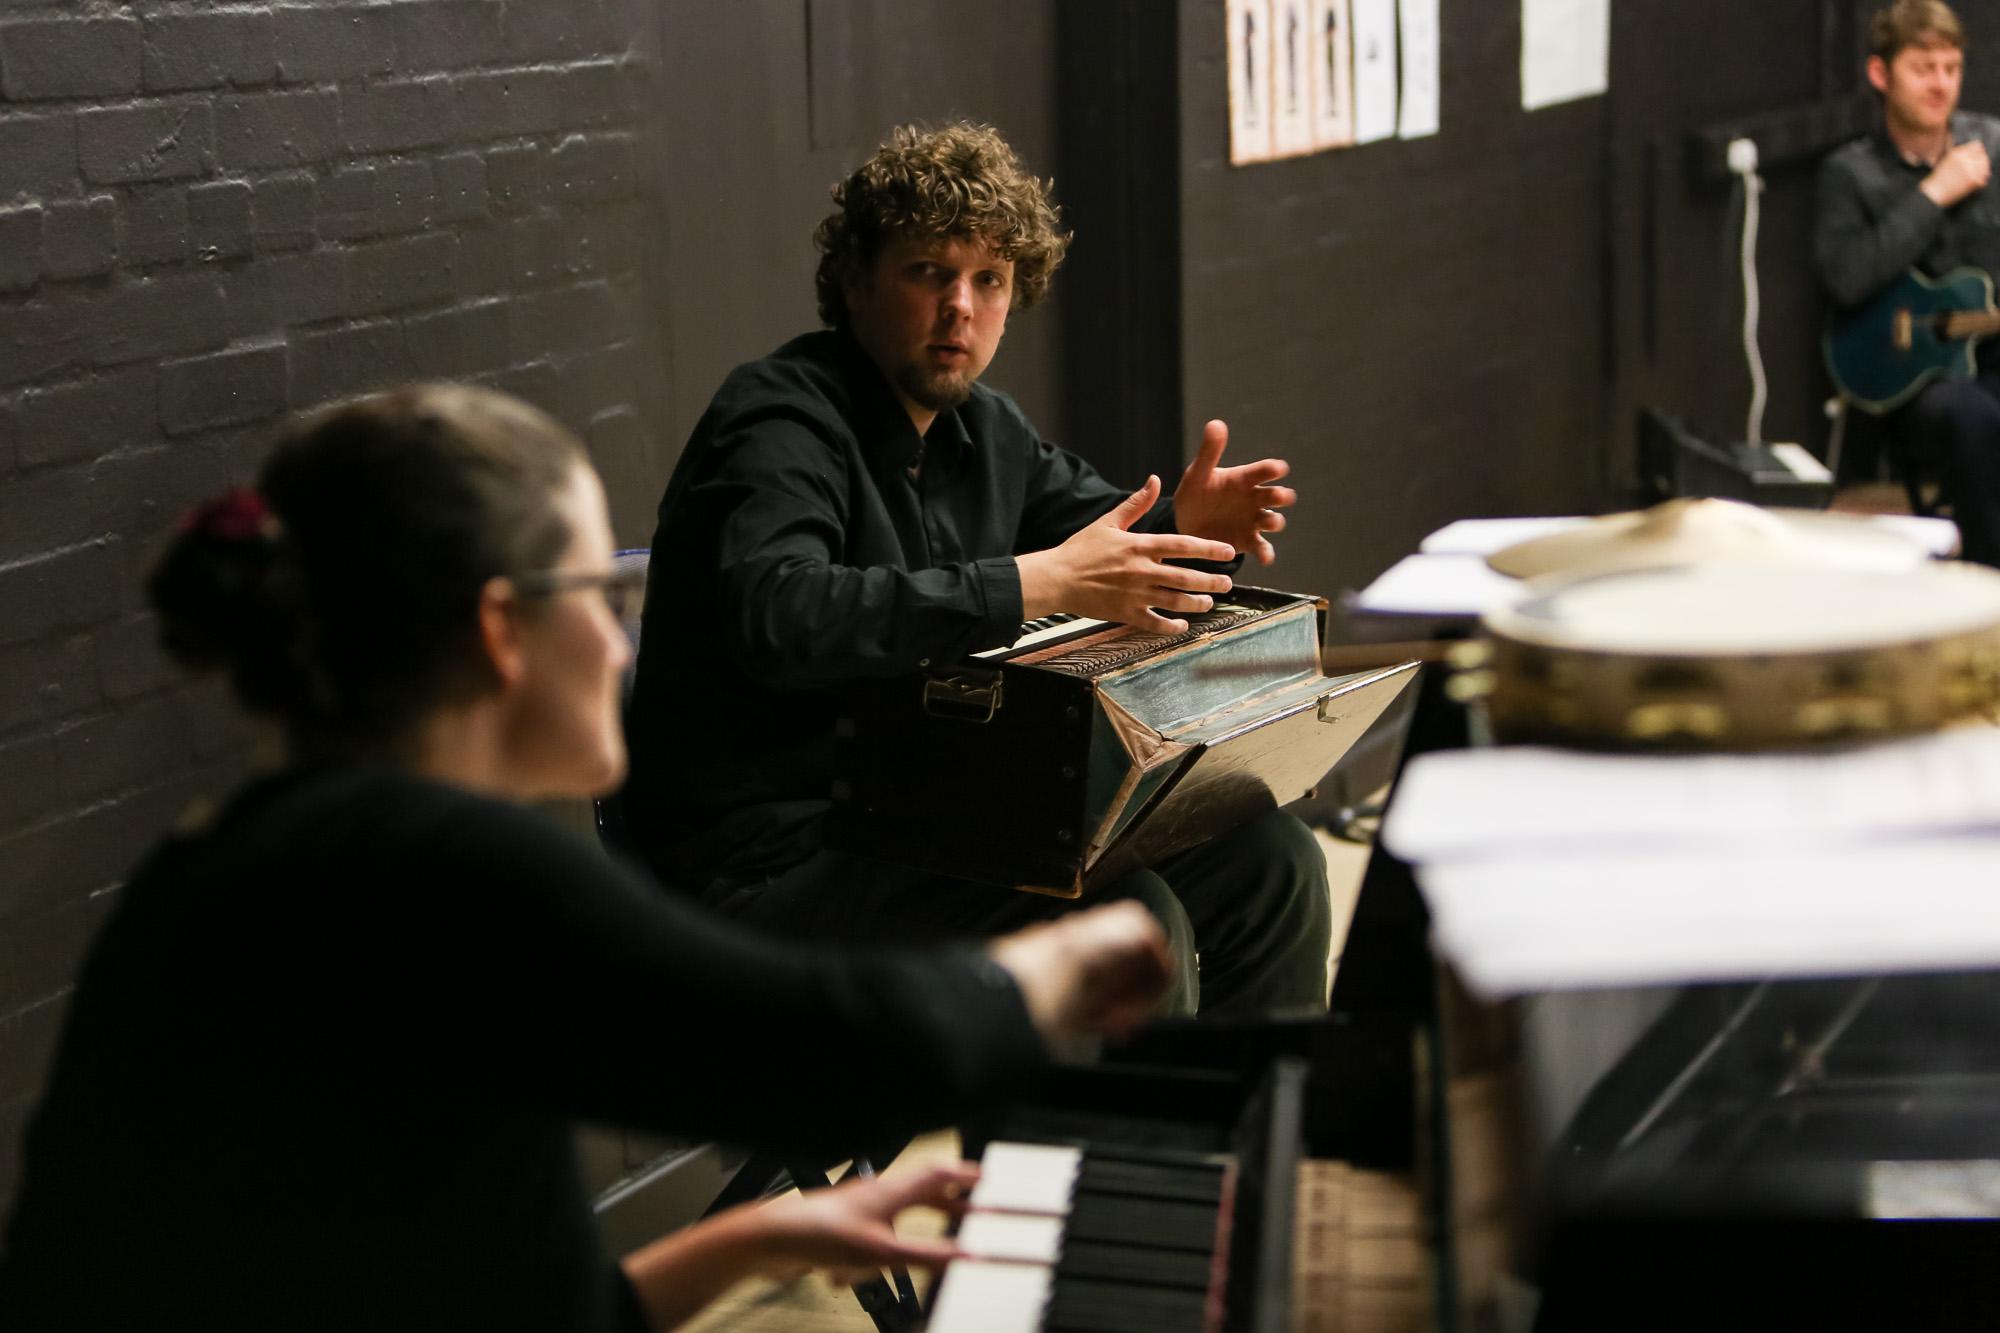 Cast Away Blog: Composer/Musician Vidar Norheim - Box of Tricks